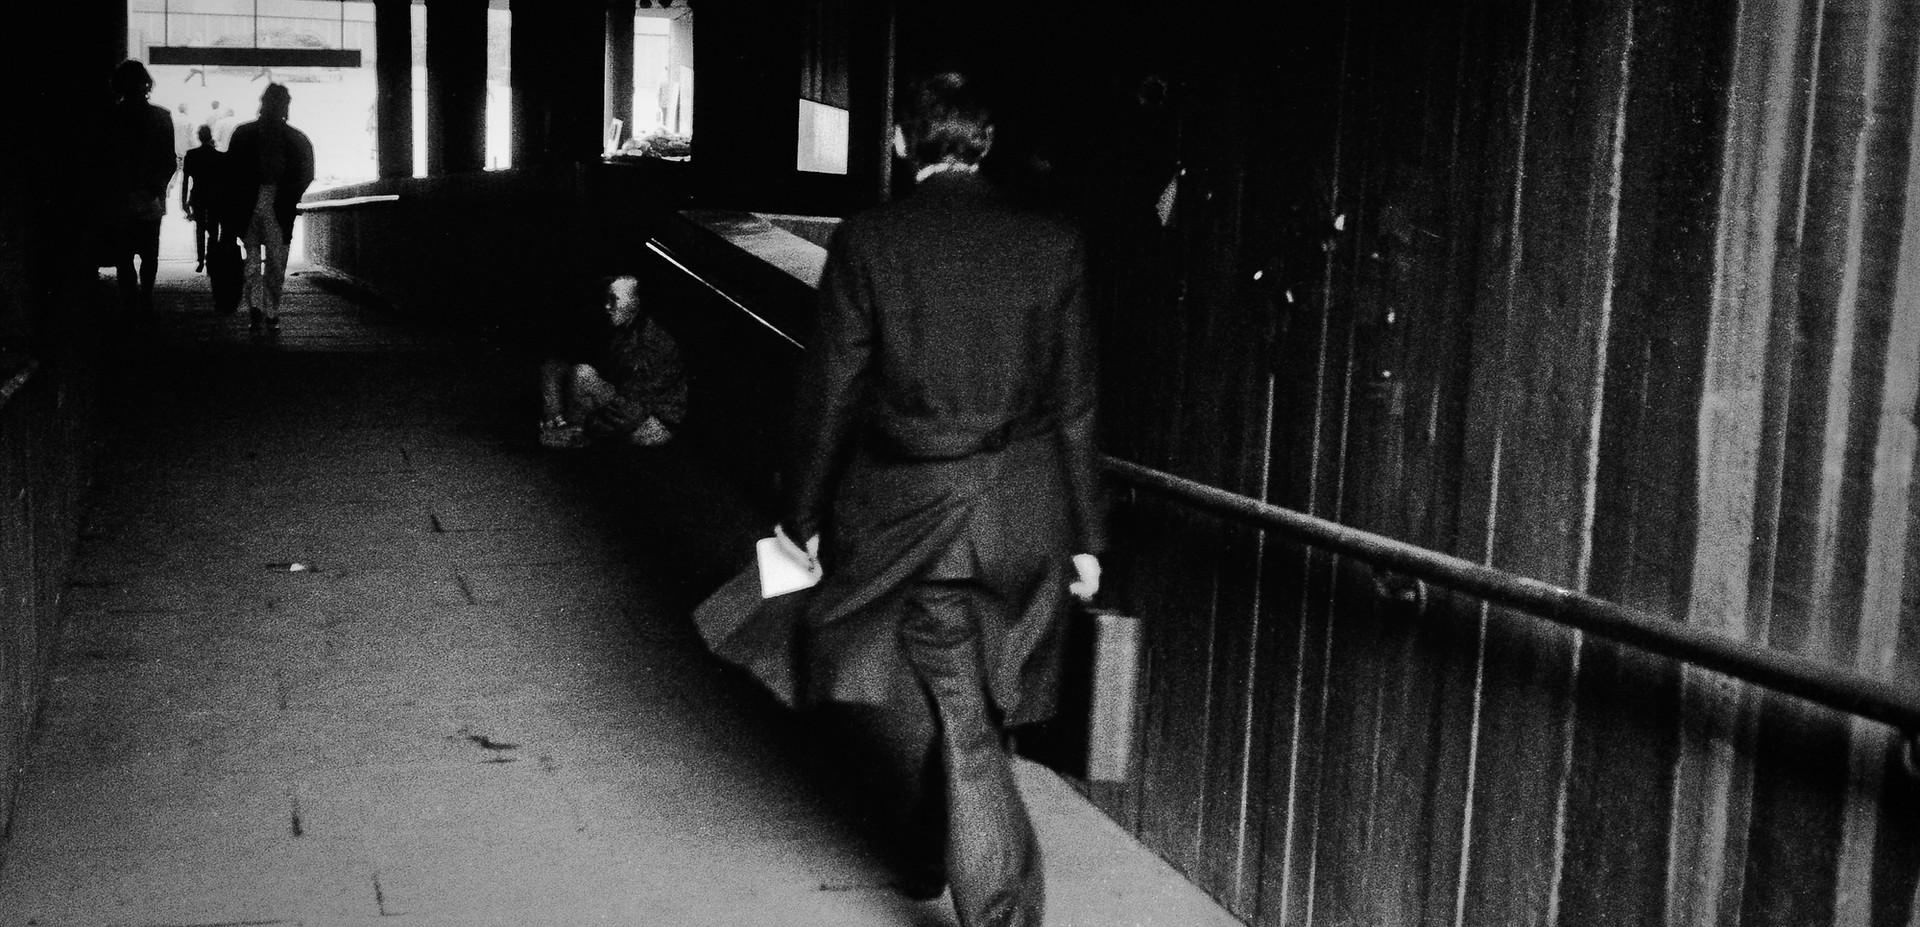 London, England 1984